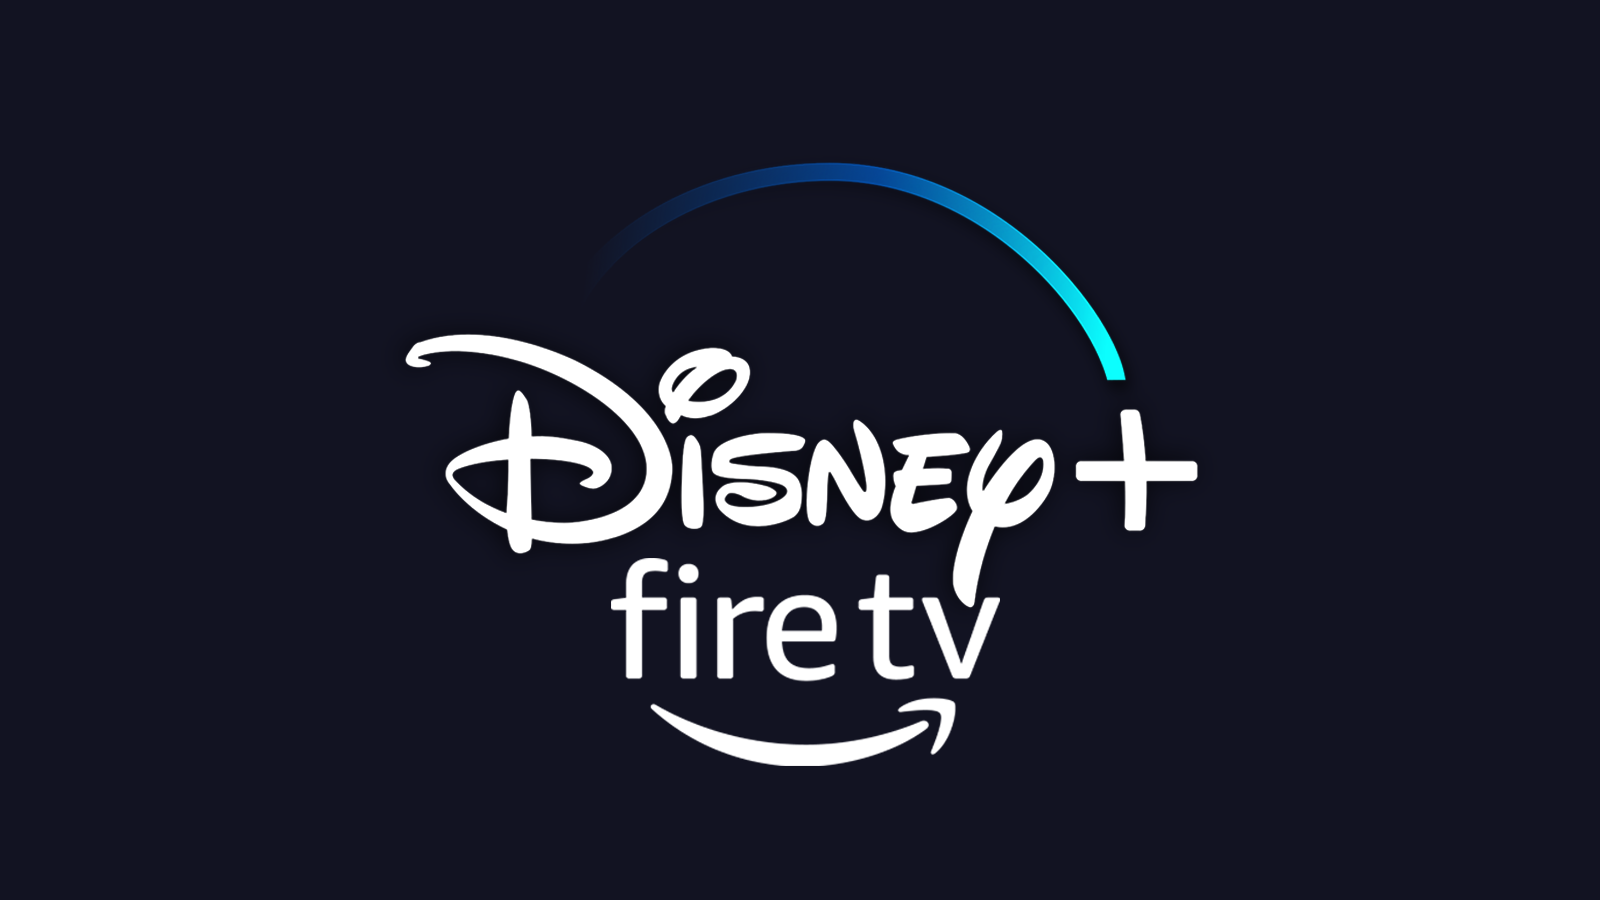 Disney + Fire Tv